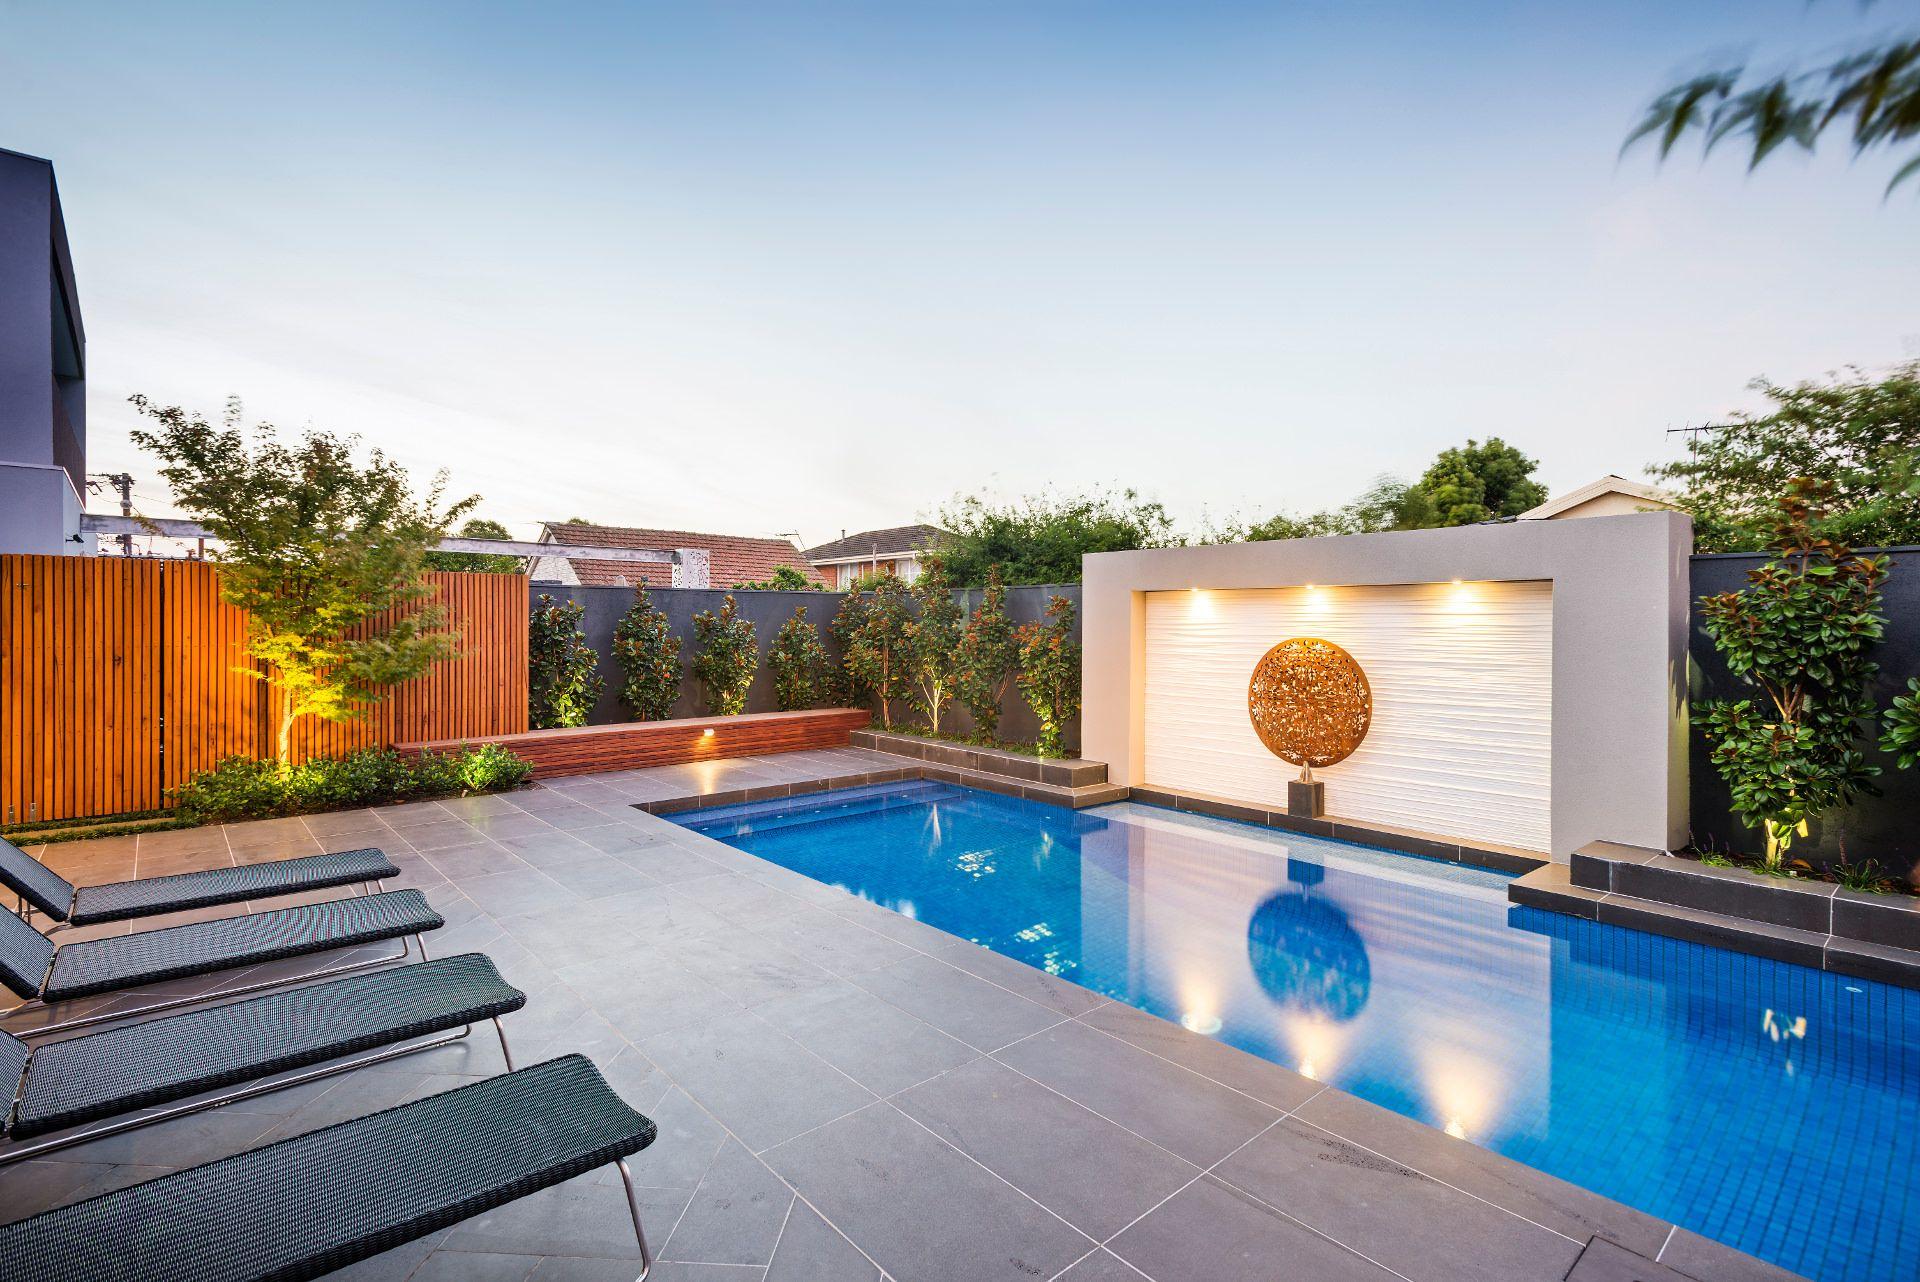 pool landscaping designs - Google Search   pool   Pinterest ... on zen pool deck, zen pool book, minimalist pool design, zen pool comics,